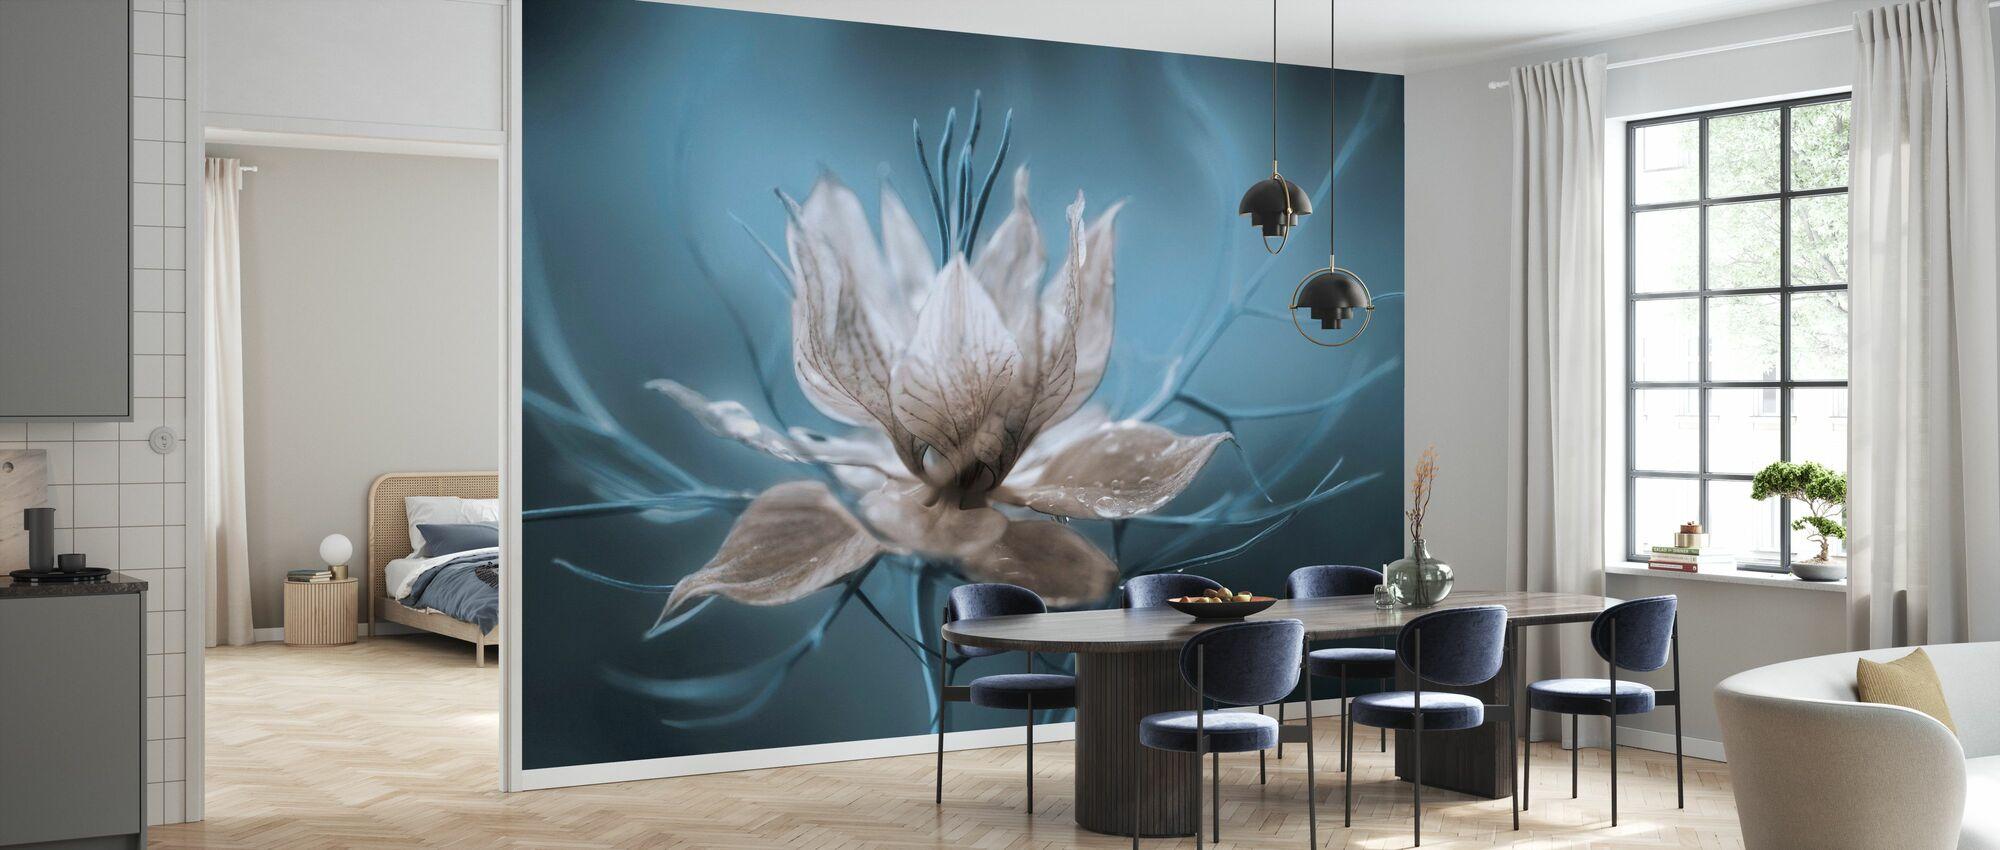 Nigella - Wallpaper - Kitchen